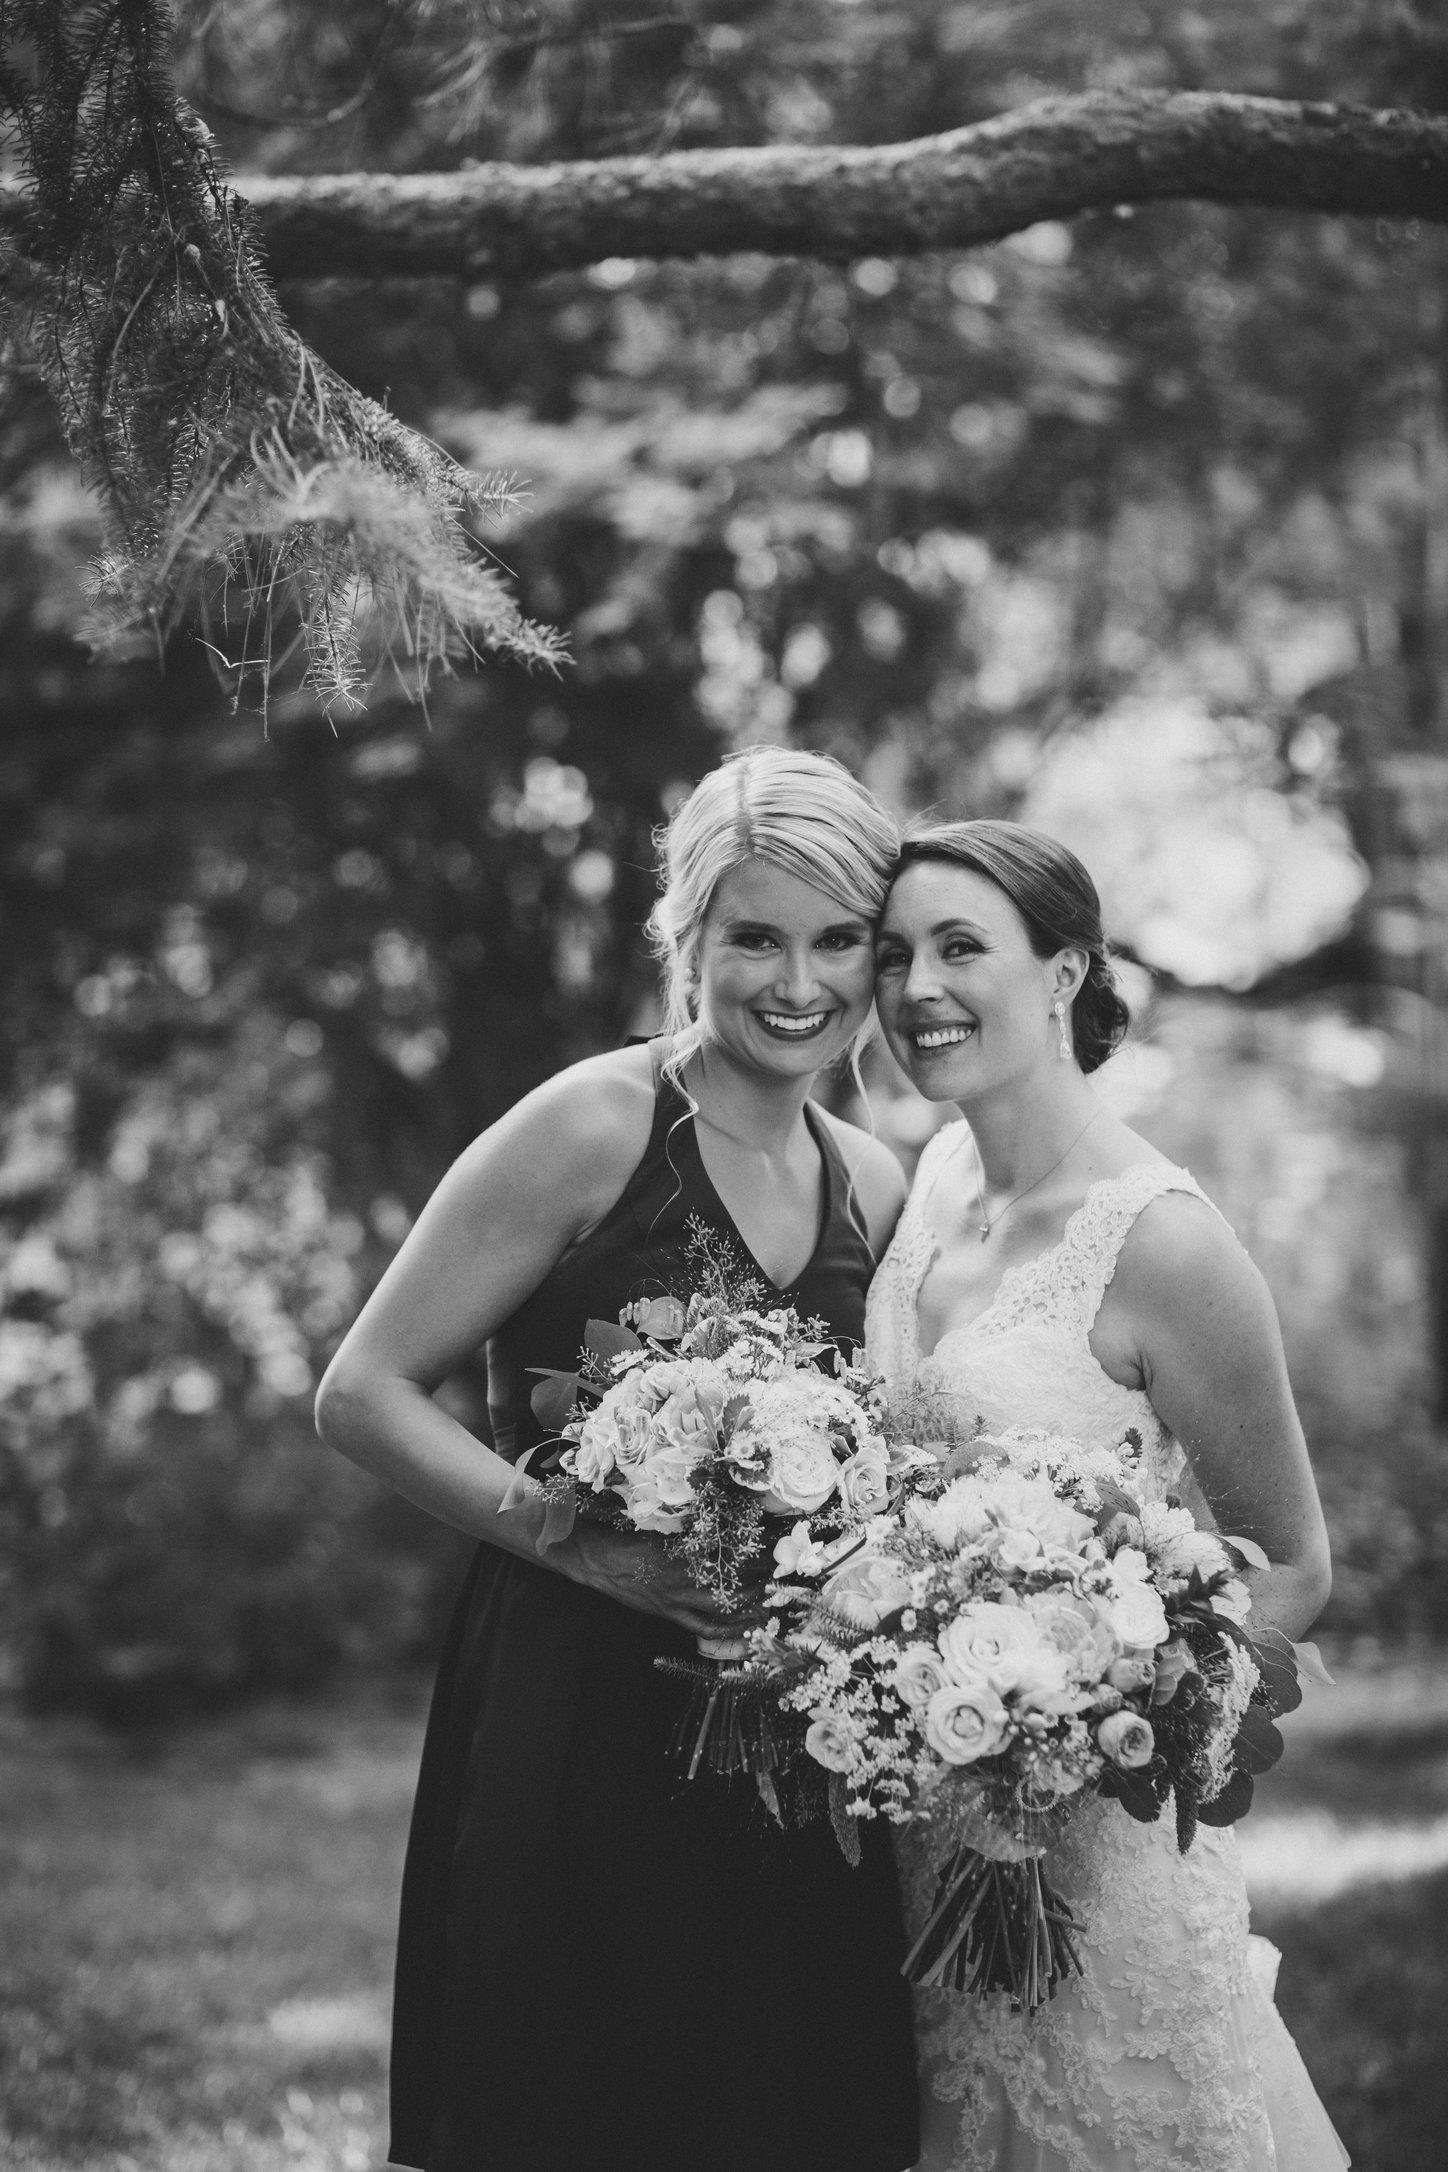 SandC-wedding-367.jpg